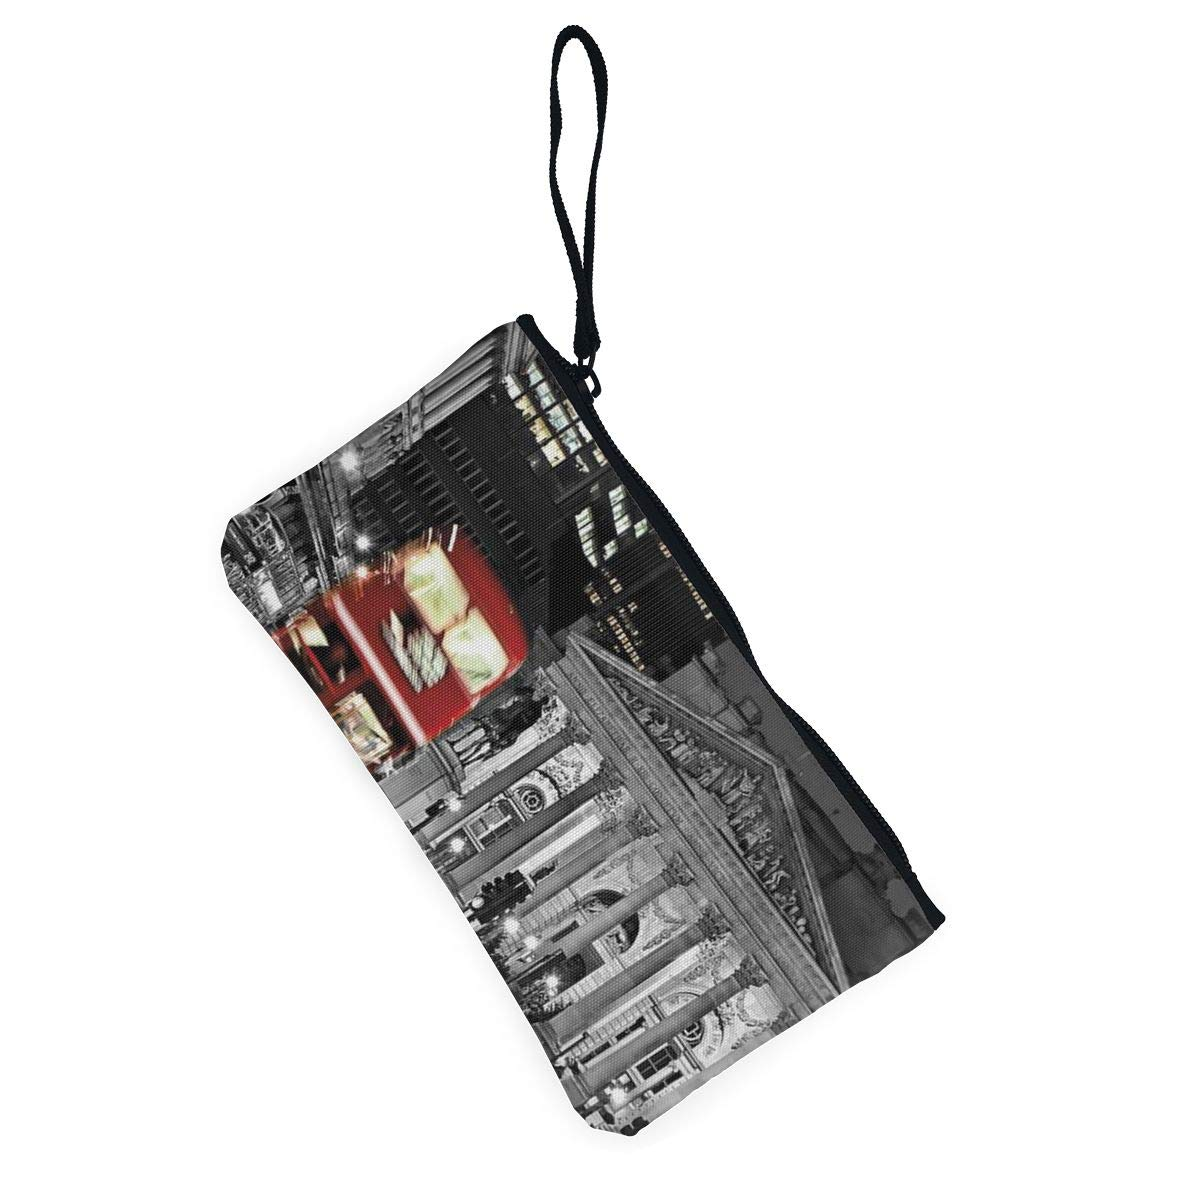 Canvas Cash Coin Purse,London Bus Print Make Up Bag Zipper Small Purse Wallets